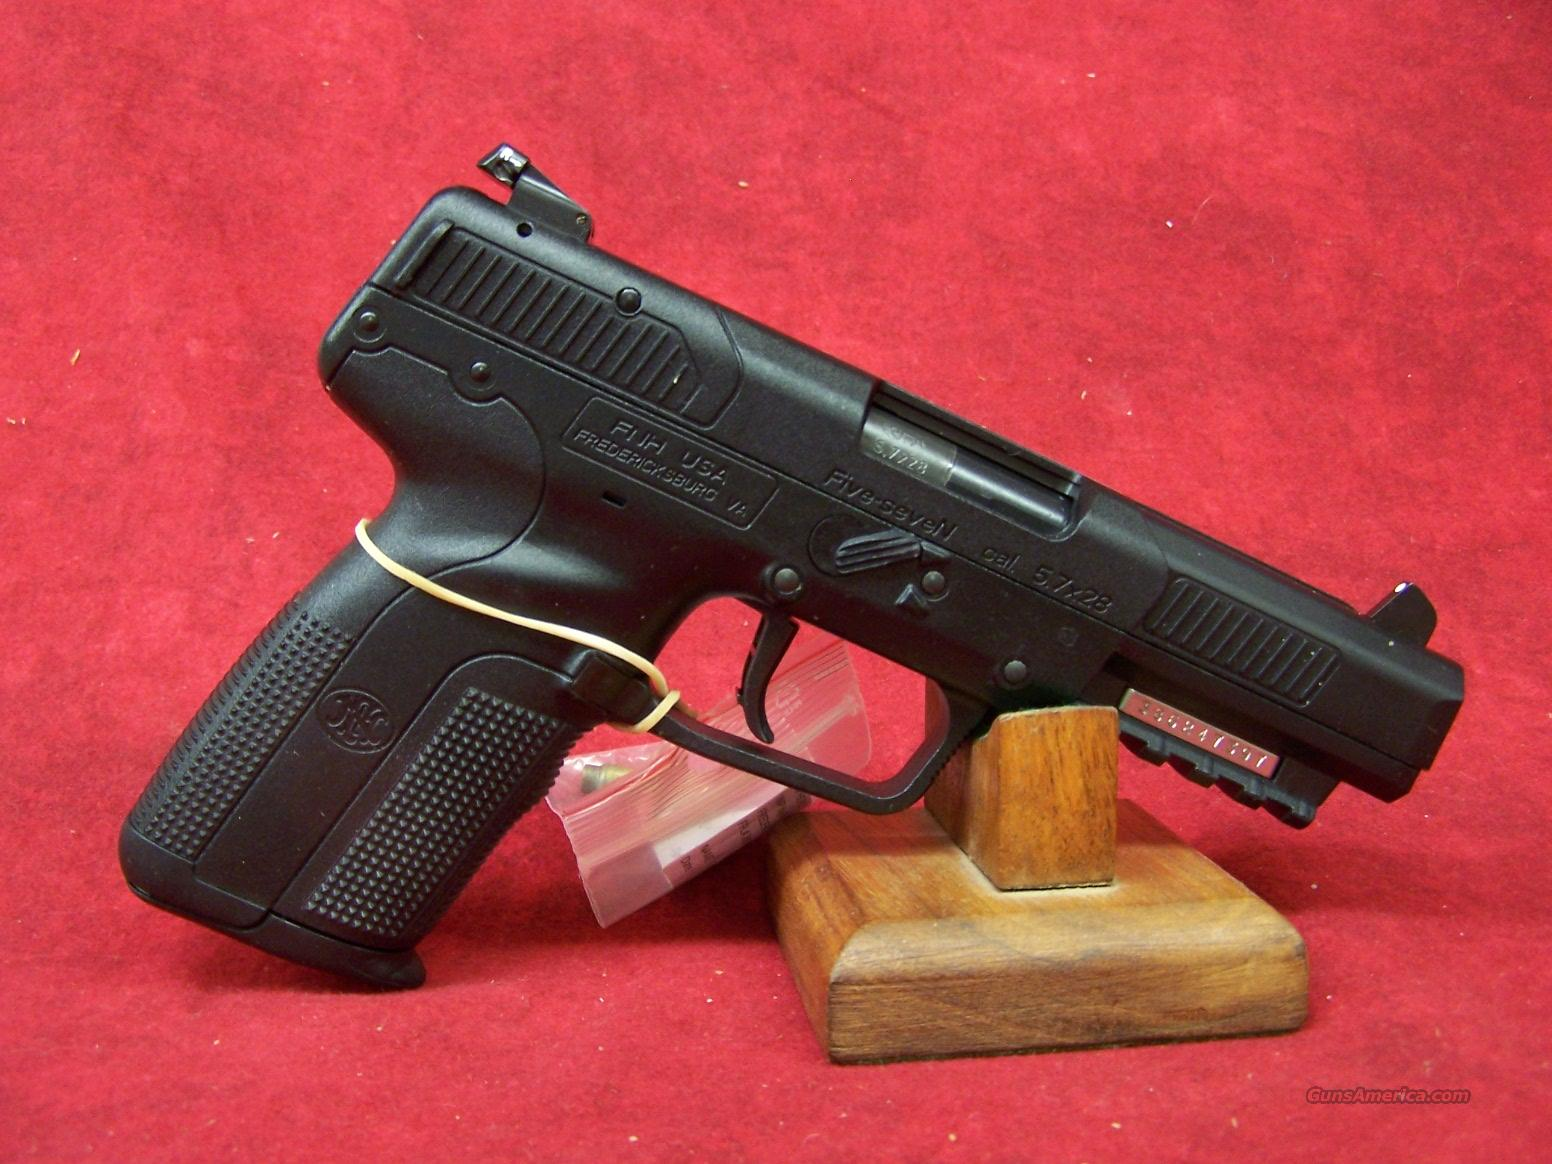 FNH Five Seven MK II 5.7 x 28mm Black 20rnd (3868929300)  Guns > Pistols > FNH - Fabrique Nationale (FN) Pistols > FiveSeven